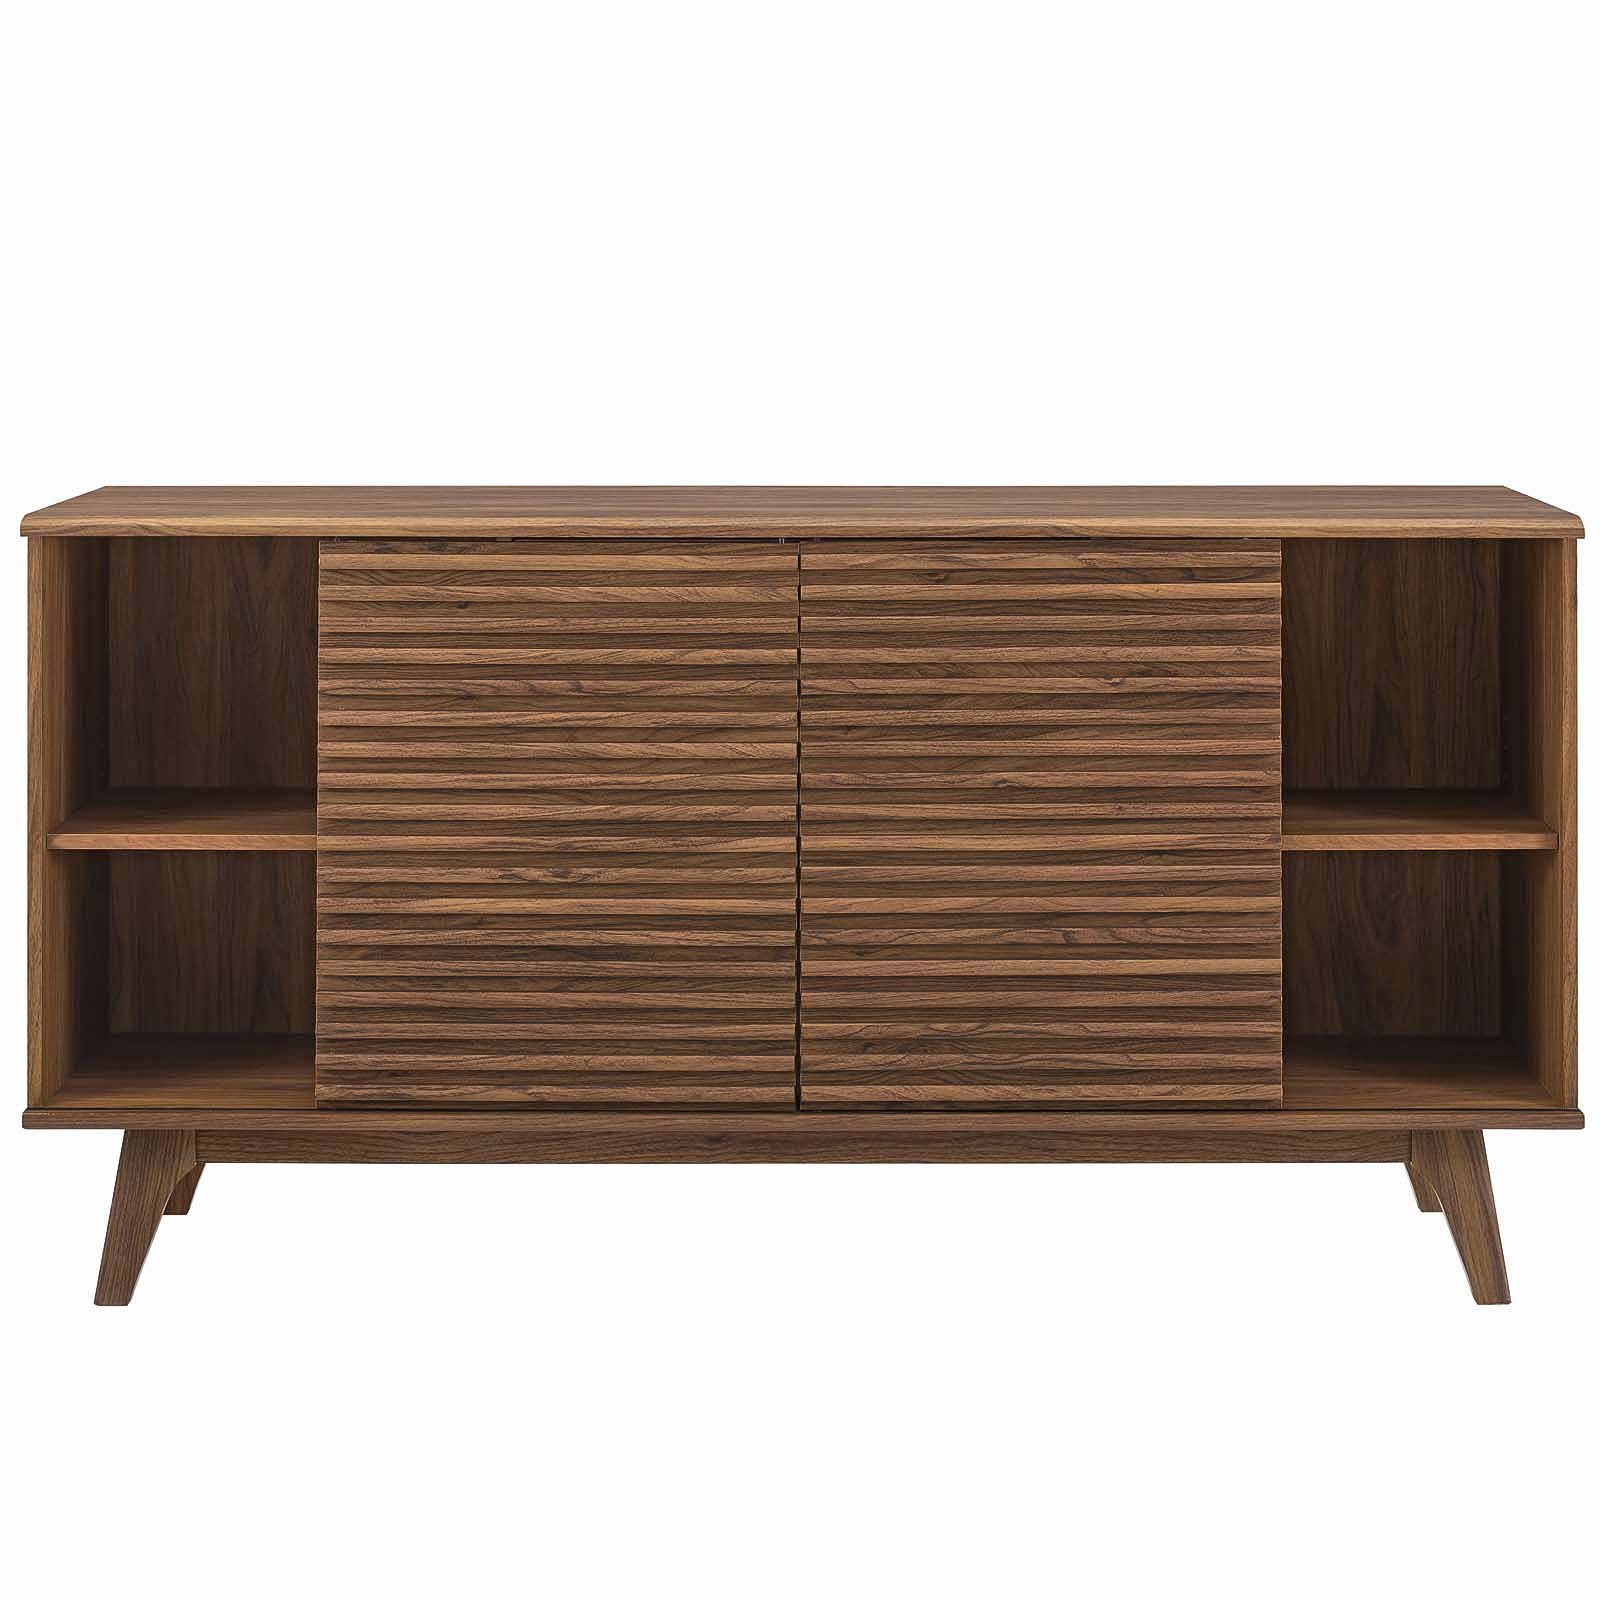 Render 63 Sideboard Buffet Table Or Tv Stand In Walnut Walmart Com Walmart Com